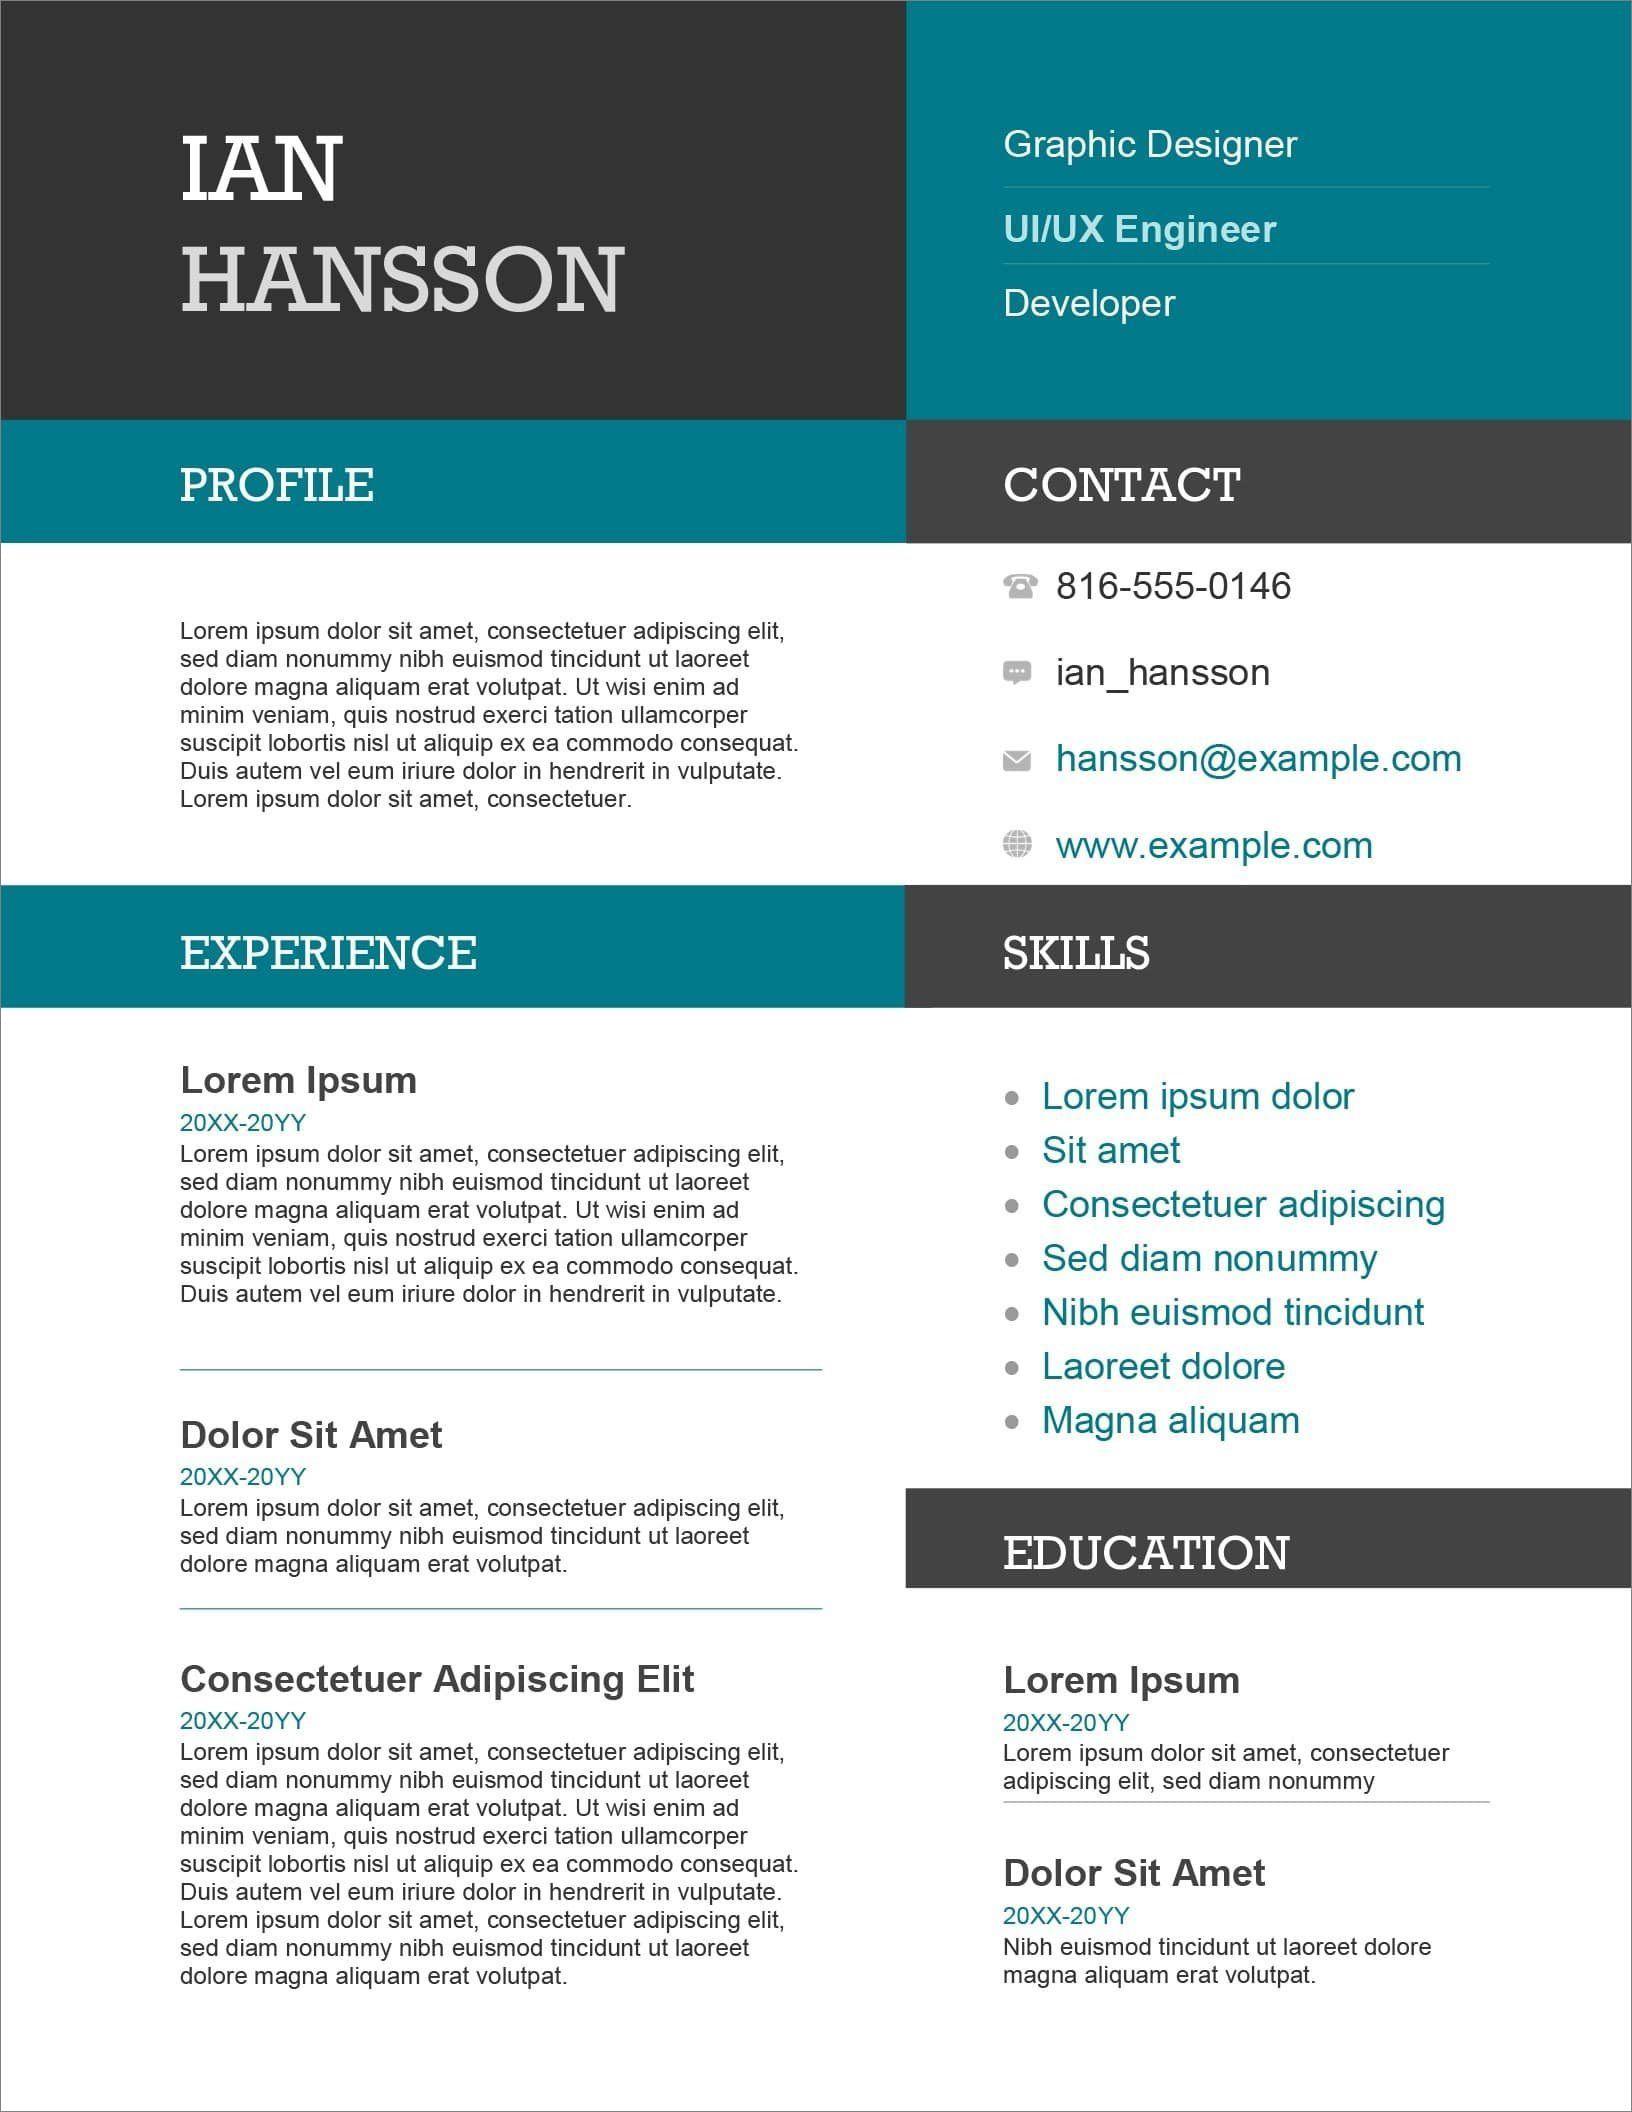 005 Formidable Microsoft Word Resume Template Image  Reddit 2019 2010 Free DownloadFull